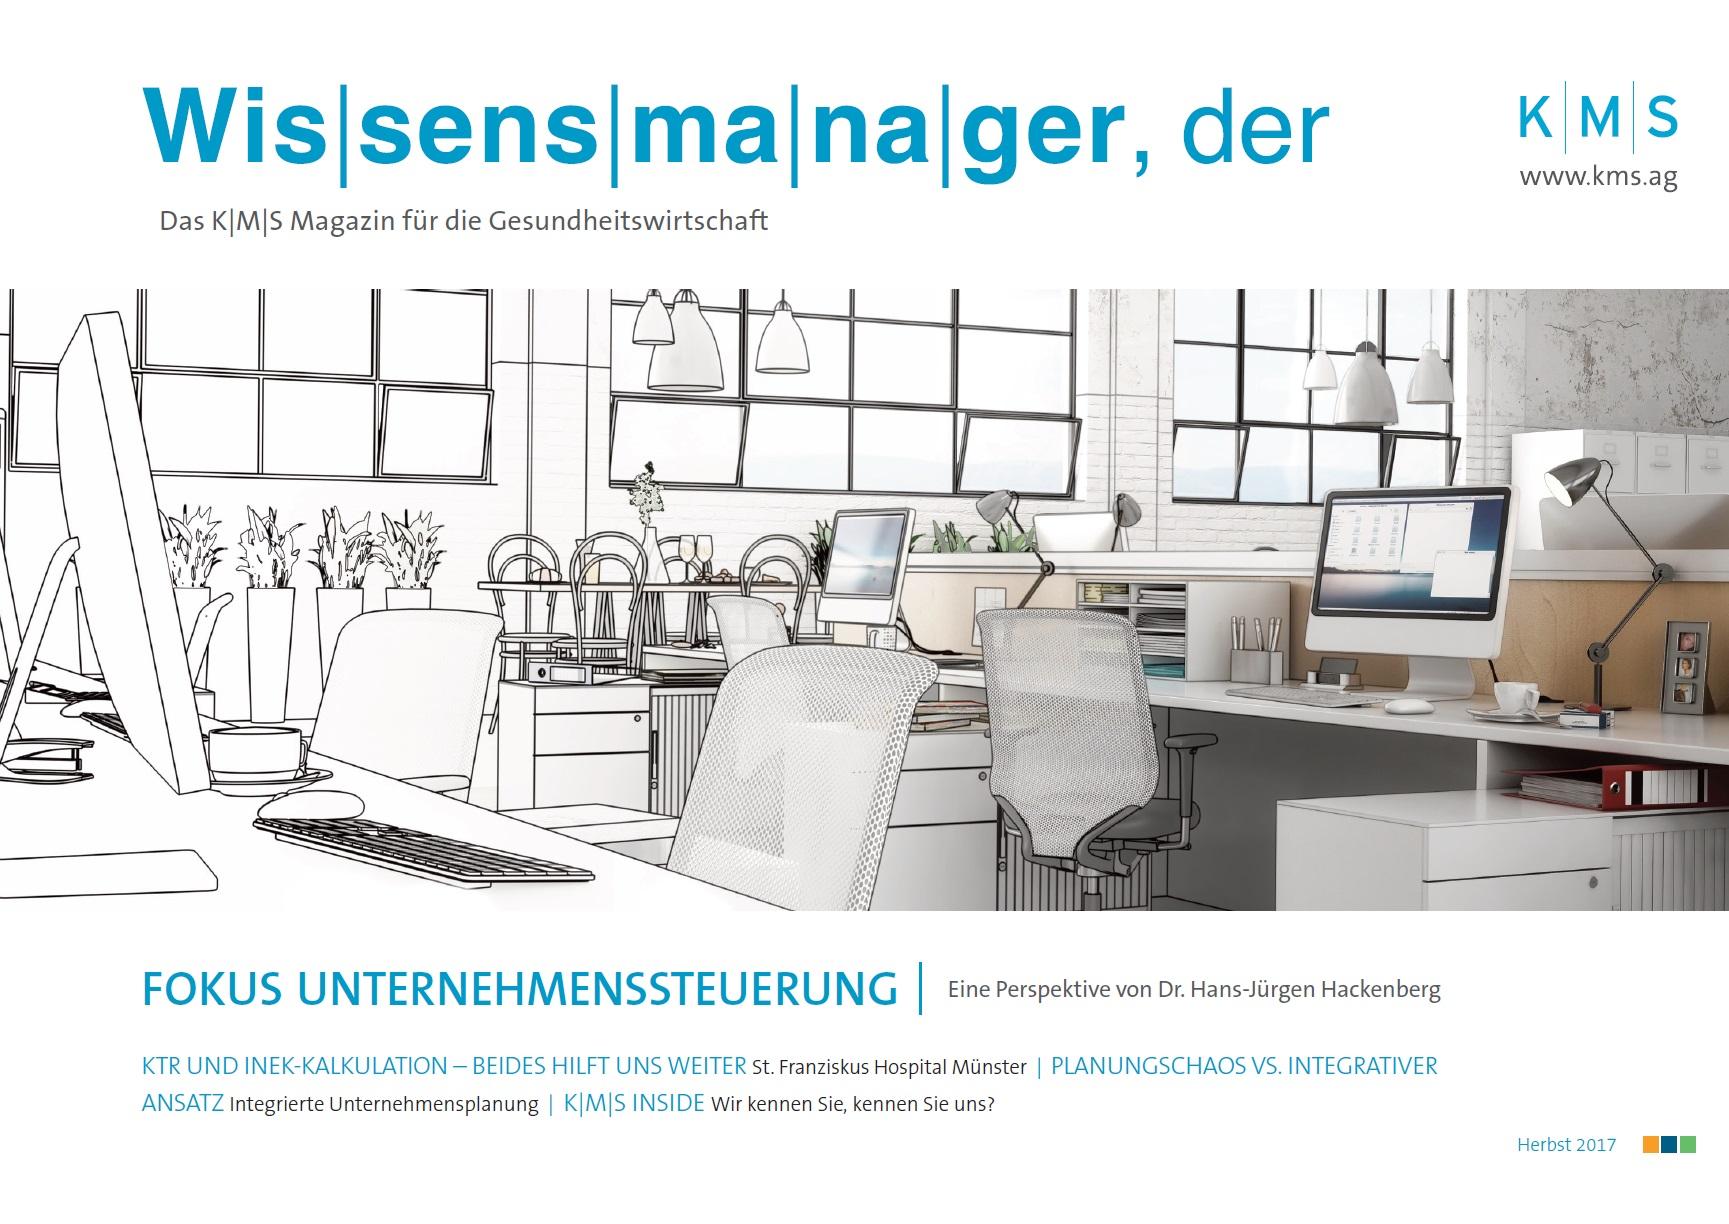 Der_Wissensmanager_Ausg1-Neuaufl_v6-Cover.jpg